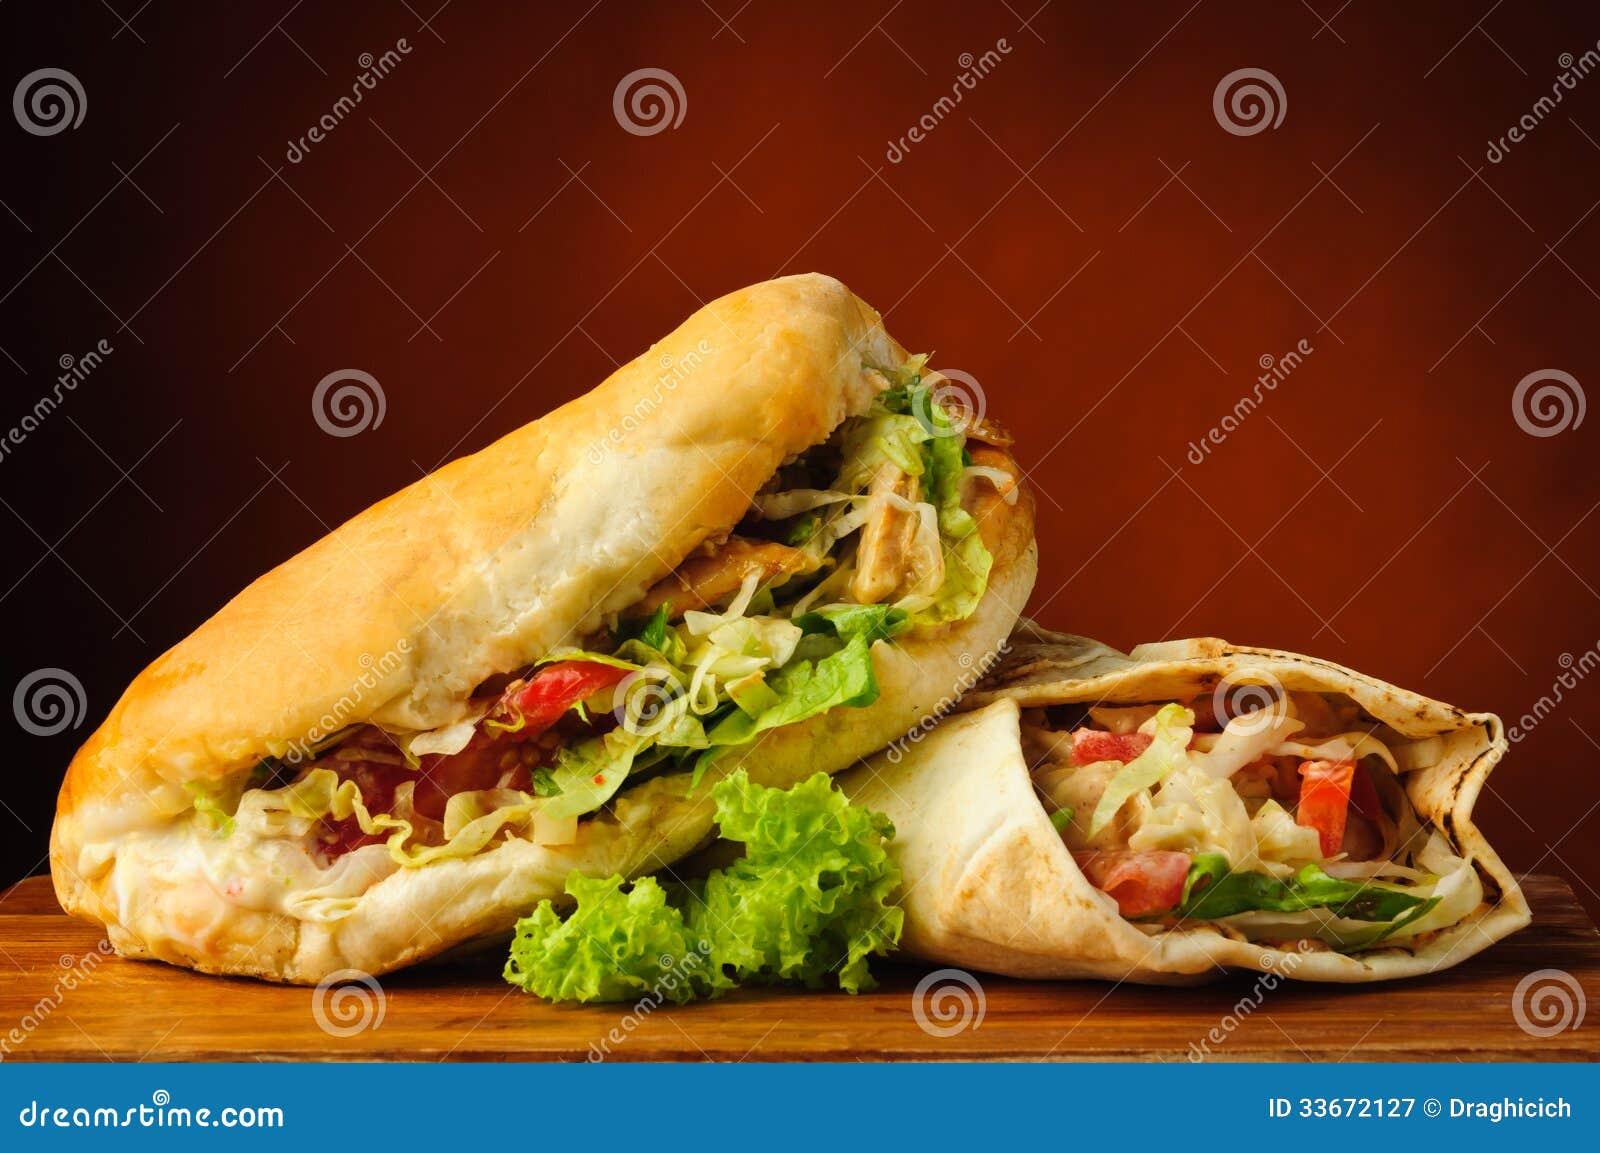 Shawarma and kebab